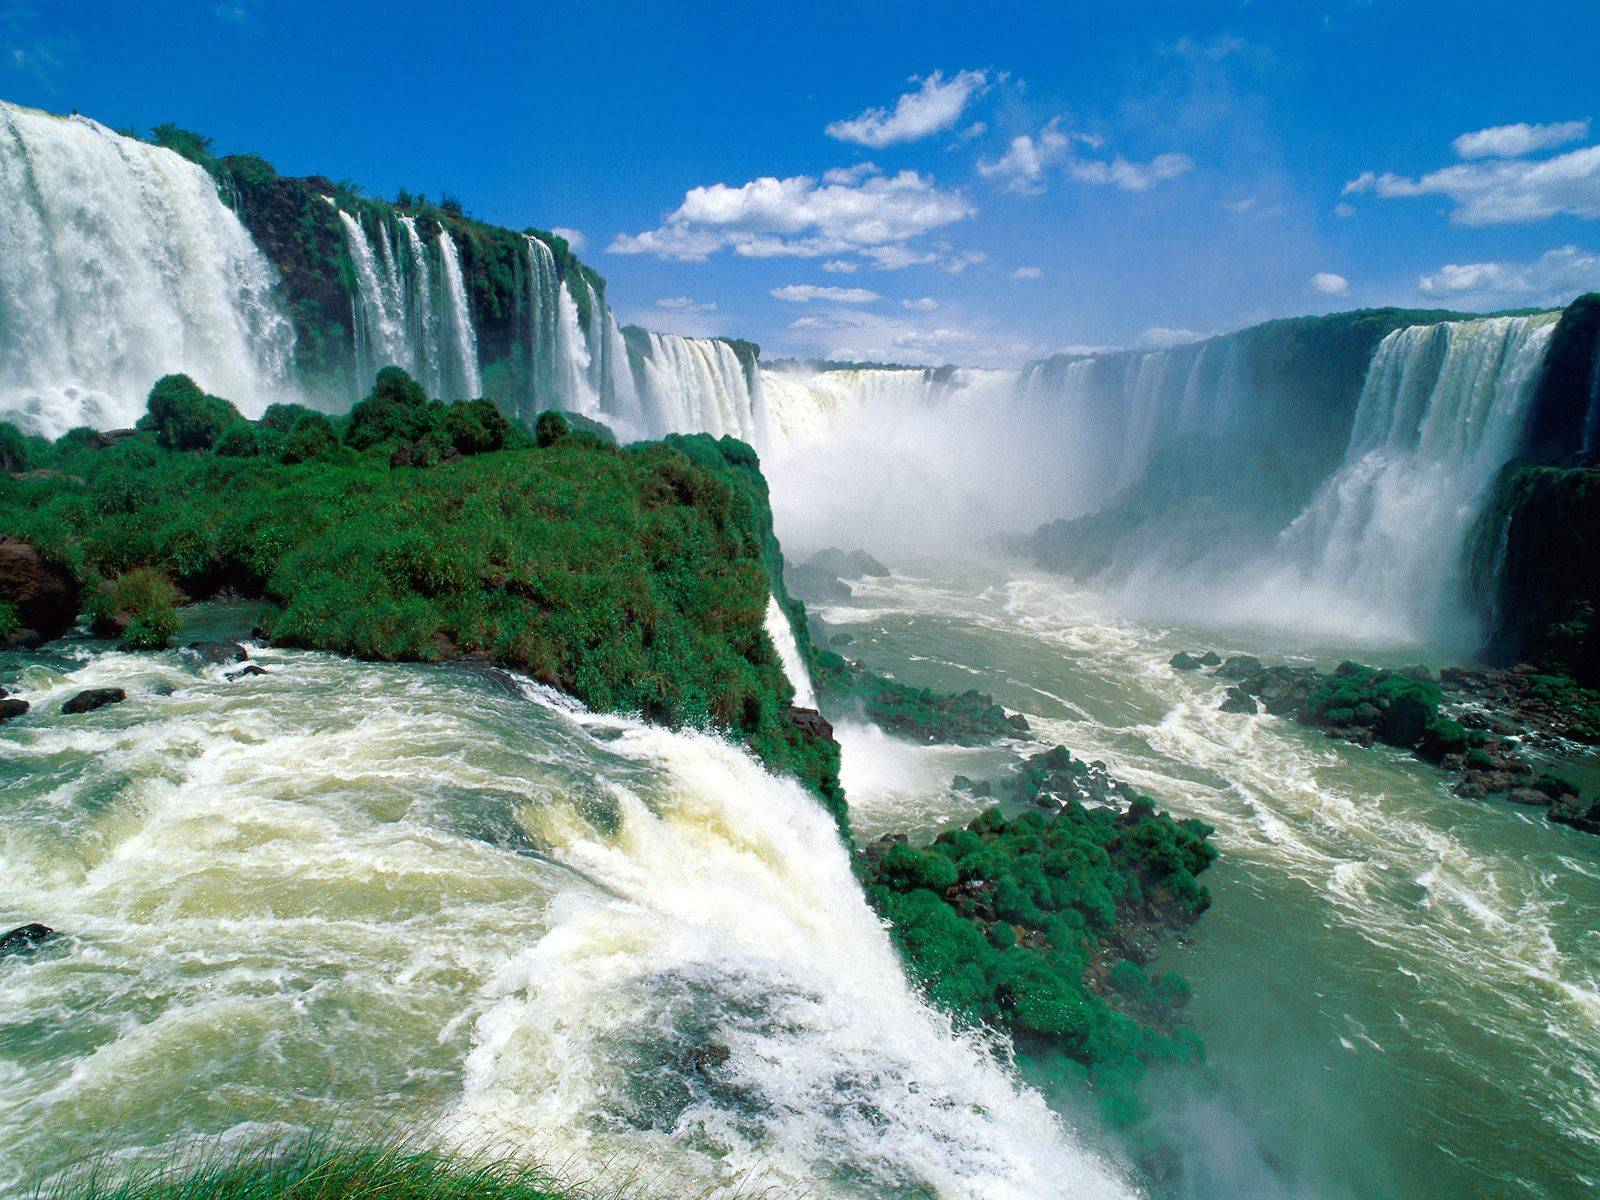 Natural Wonder of Iguazu Falls